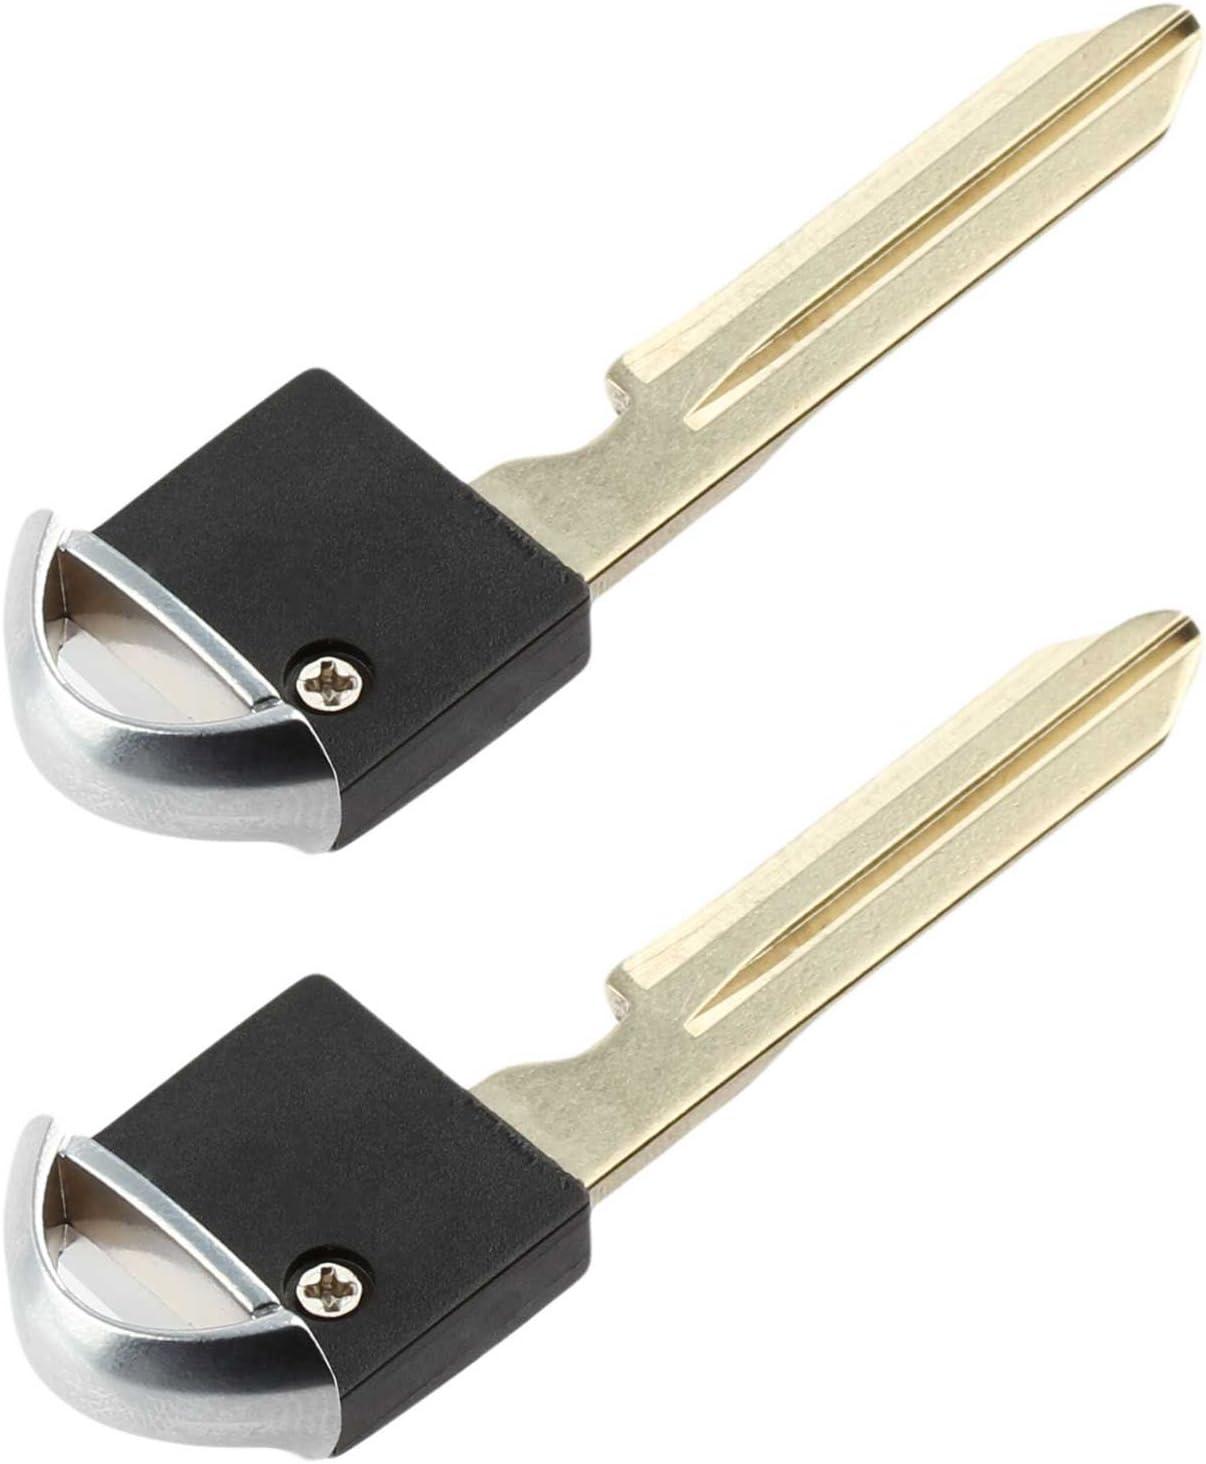 KeylessOption Keyless Entry Remote Fob Emergency Insert Key Uncut Blade Blank No Chip for Nissan Infiniti Smart